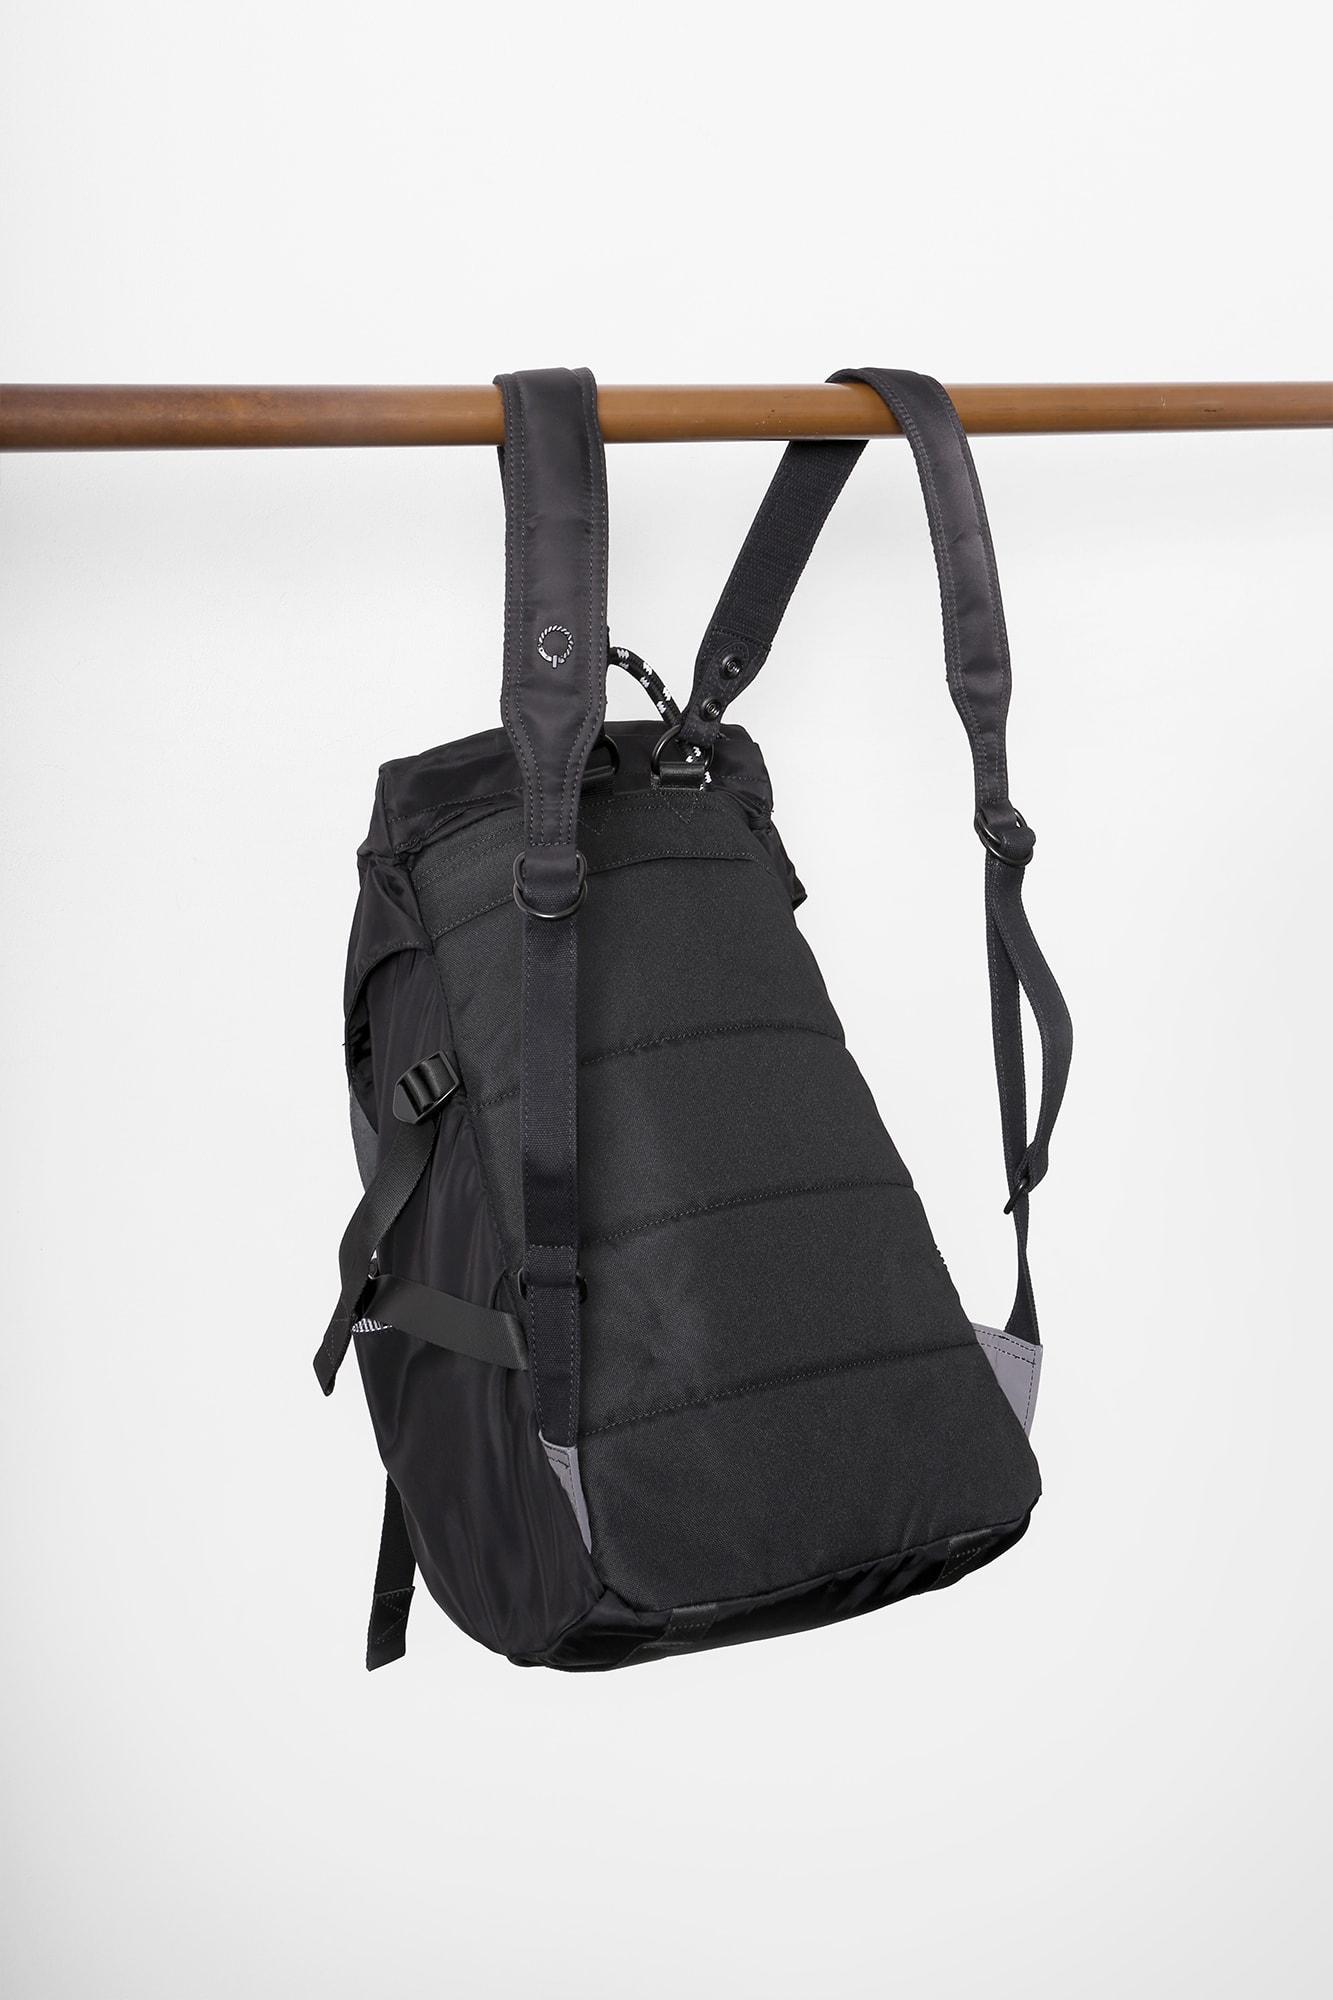 41f8986fe796 Stighlorgan Plato Laptop Backpack